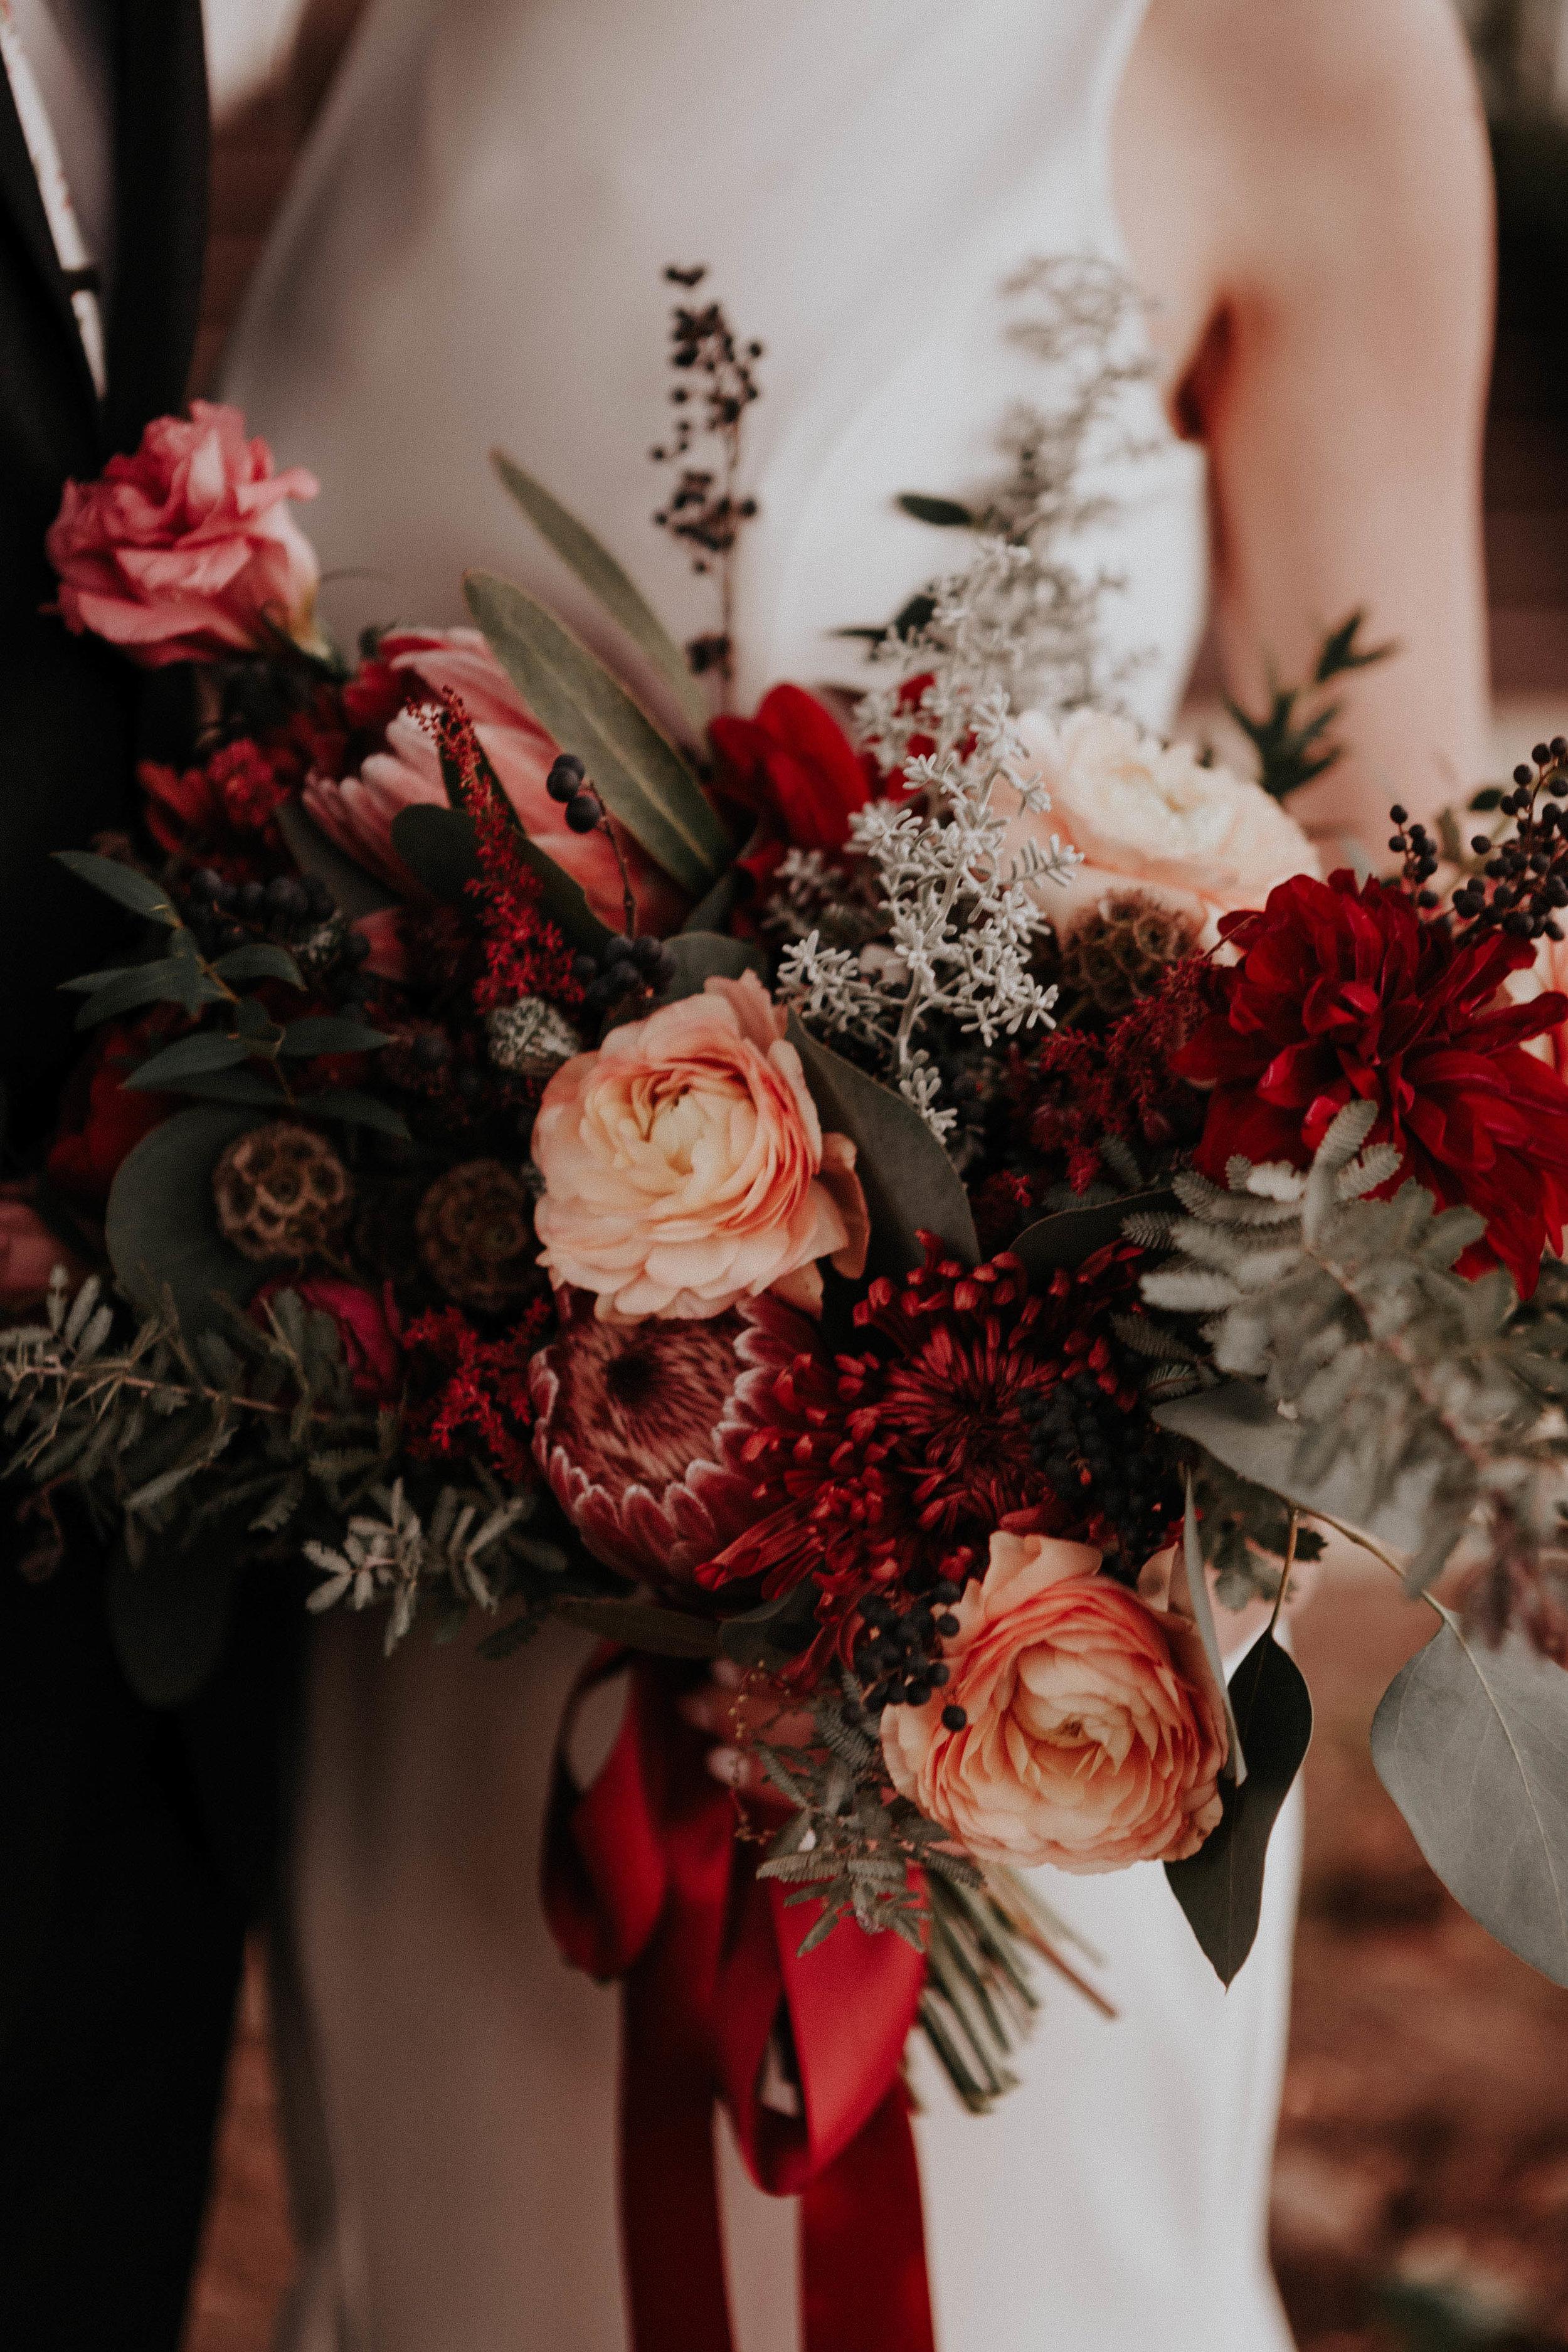 Charis_Lauren_Romantic_Wedding_Photographer_Nashville_01018.jpg